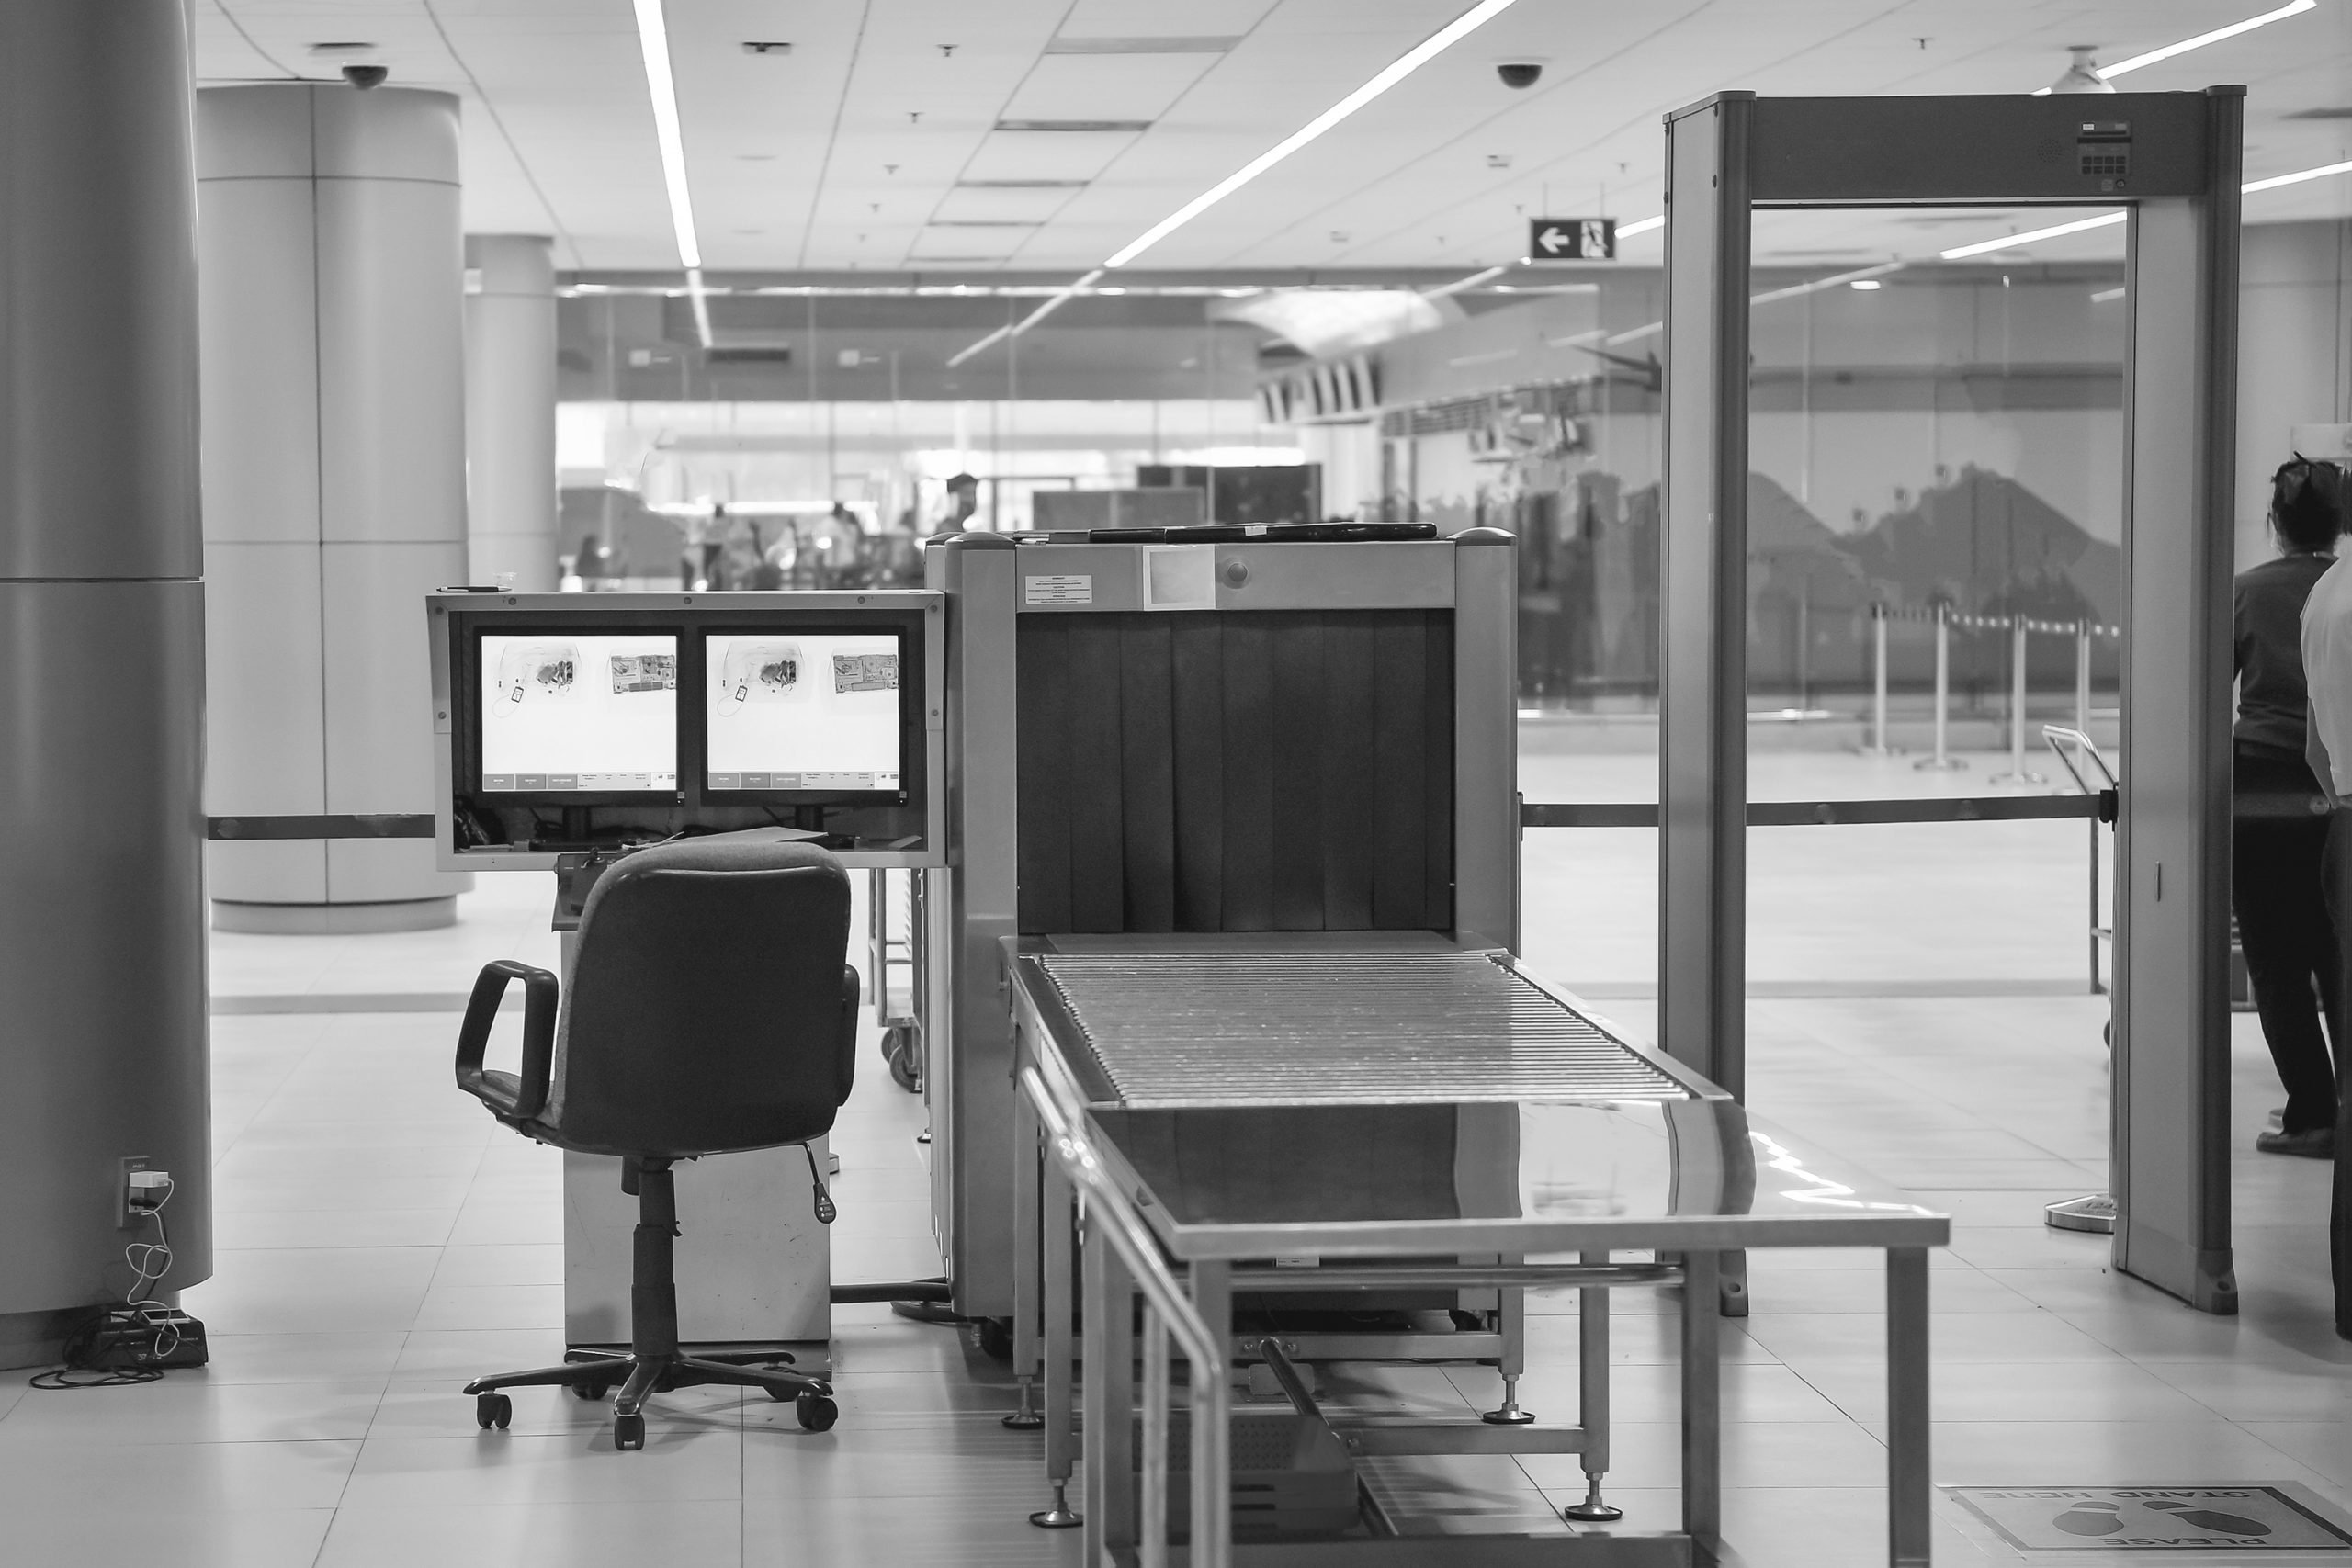 screenAdapt_airport_header_1